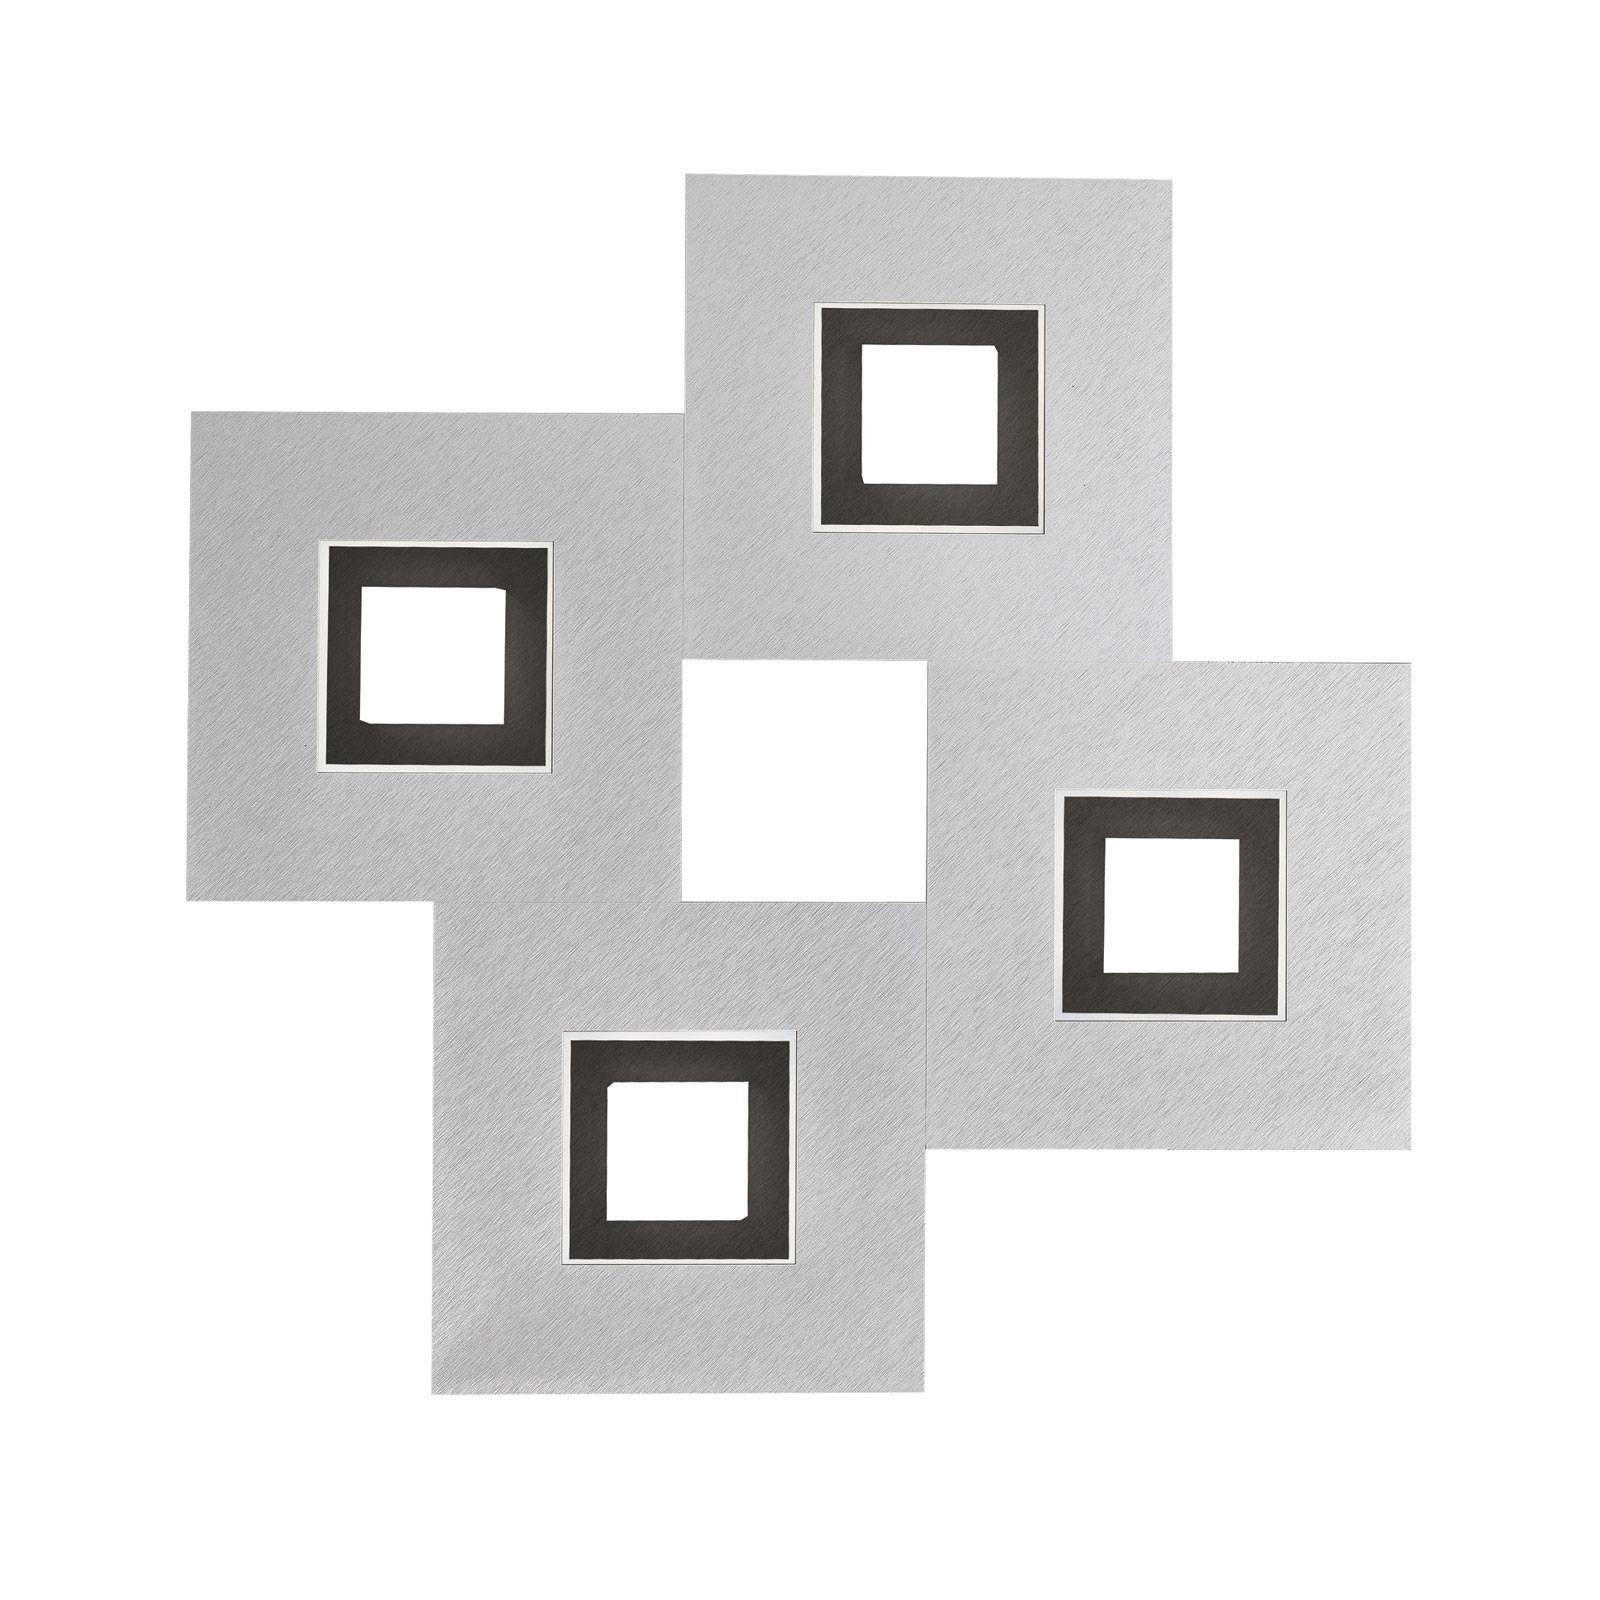 GROSSMANN Karree, 4 lysk., 50x50, aluminium, svart